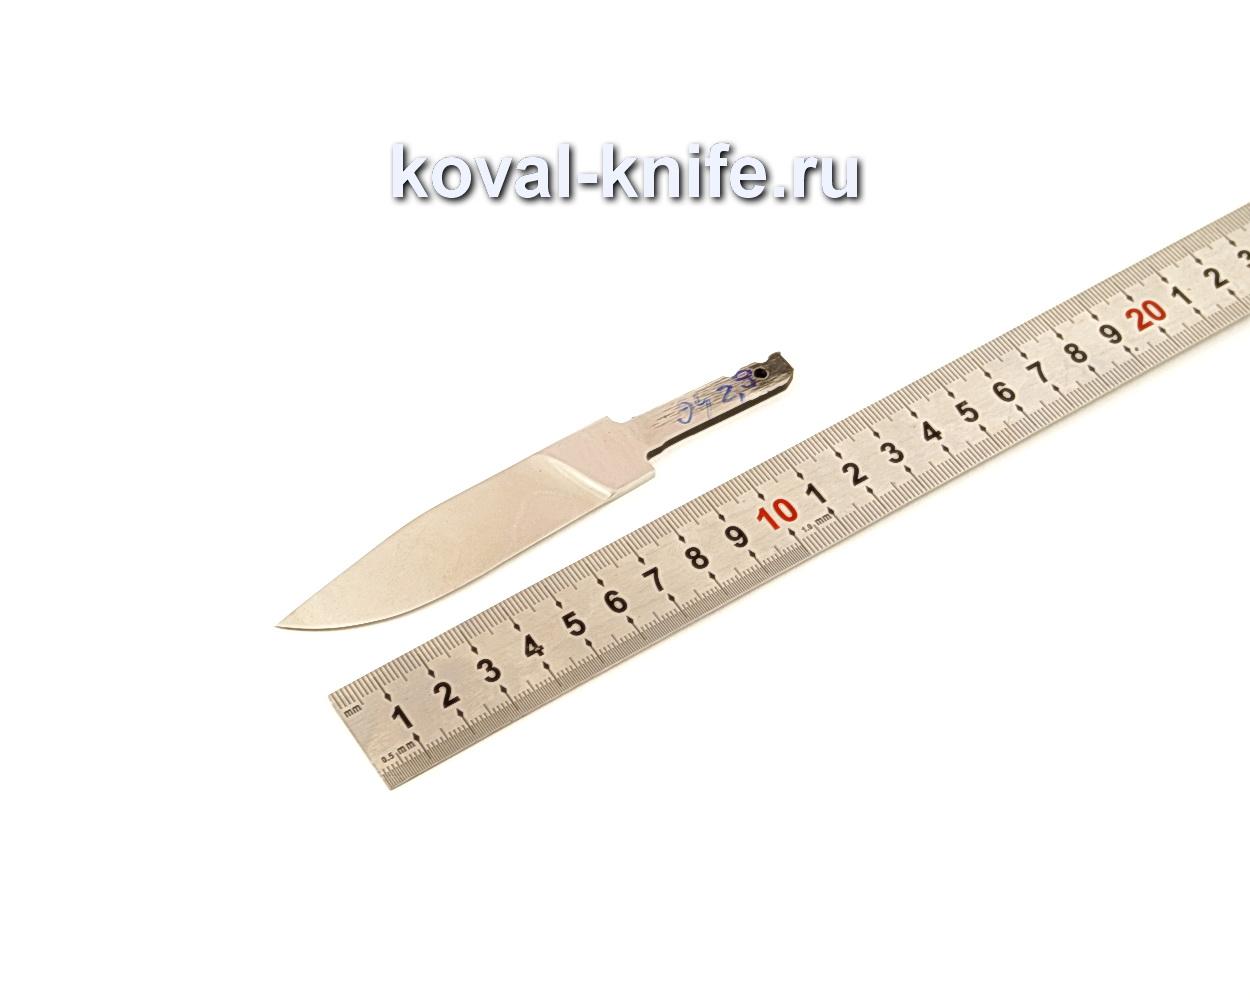 Клинок для ножа Грибник из кованой 95Х18 N94